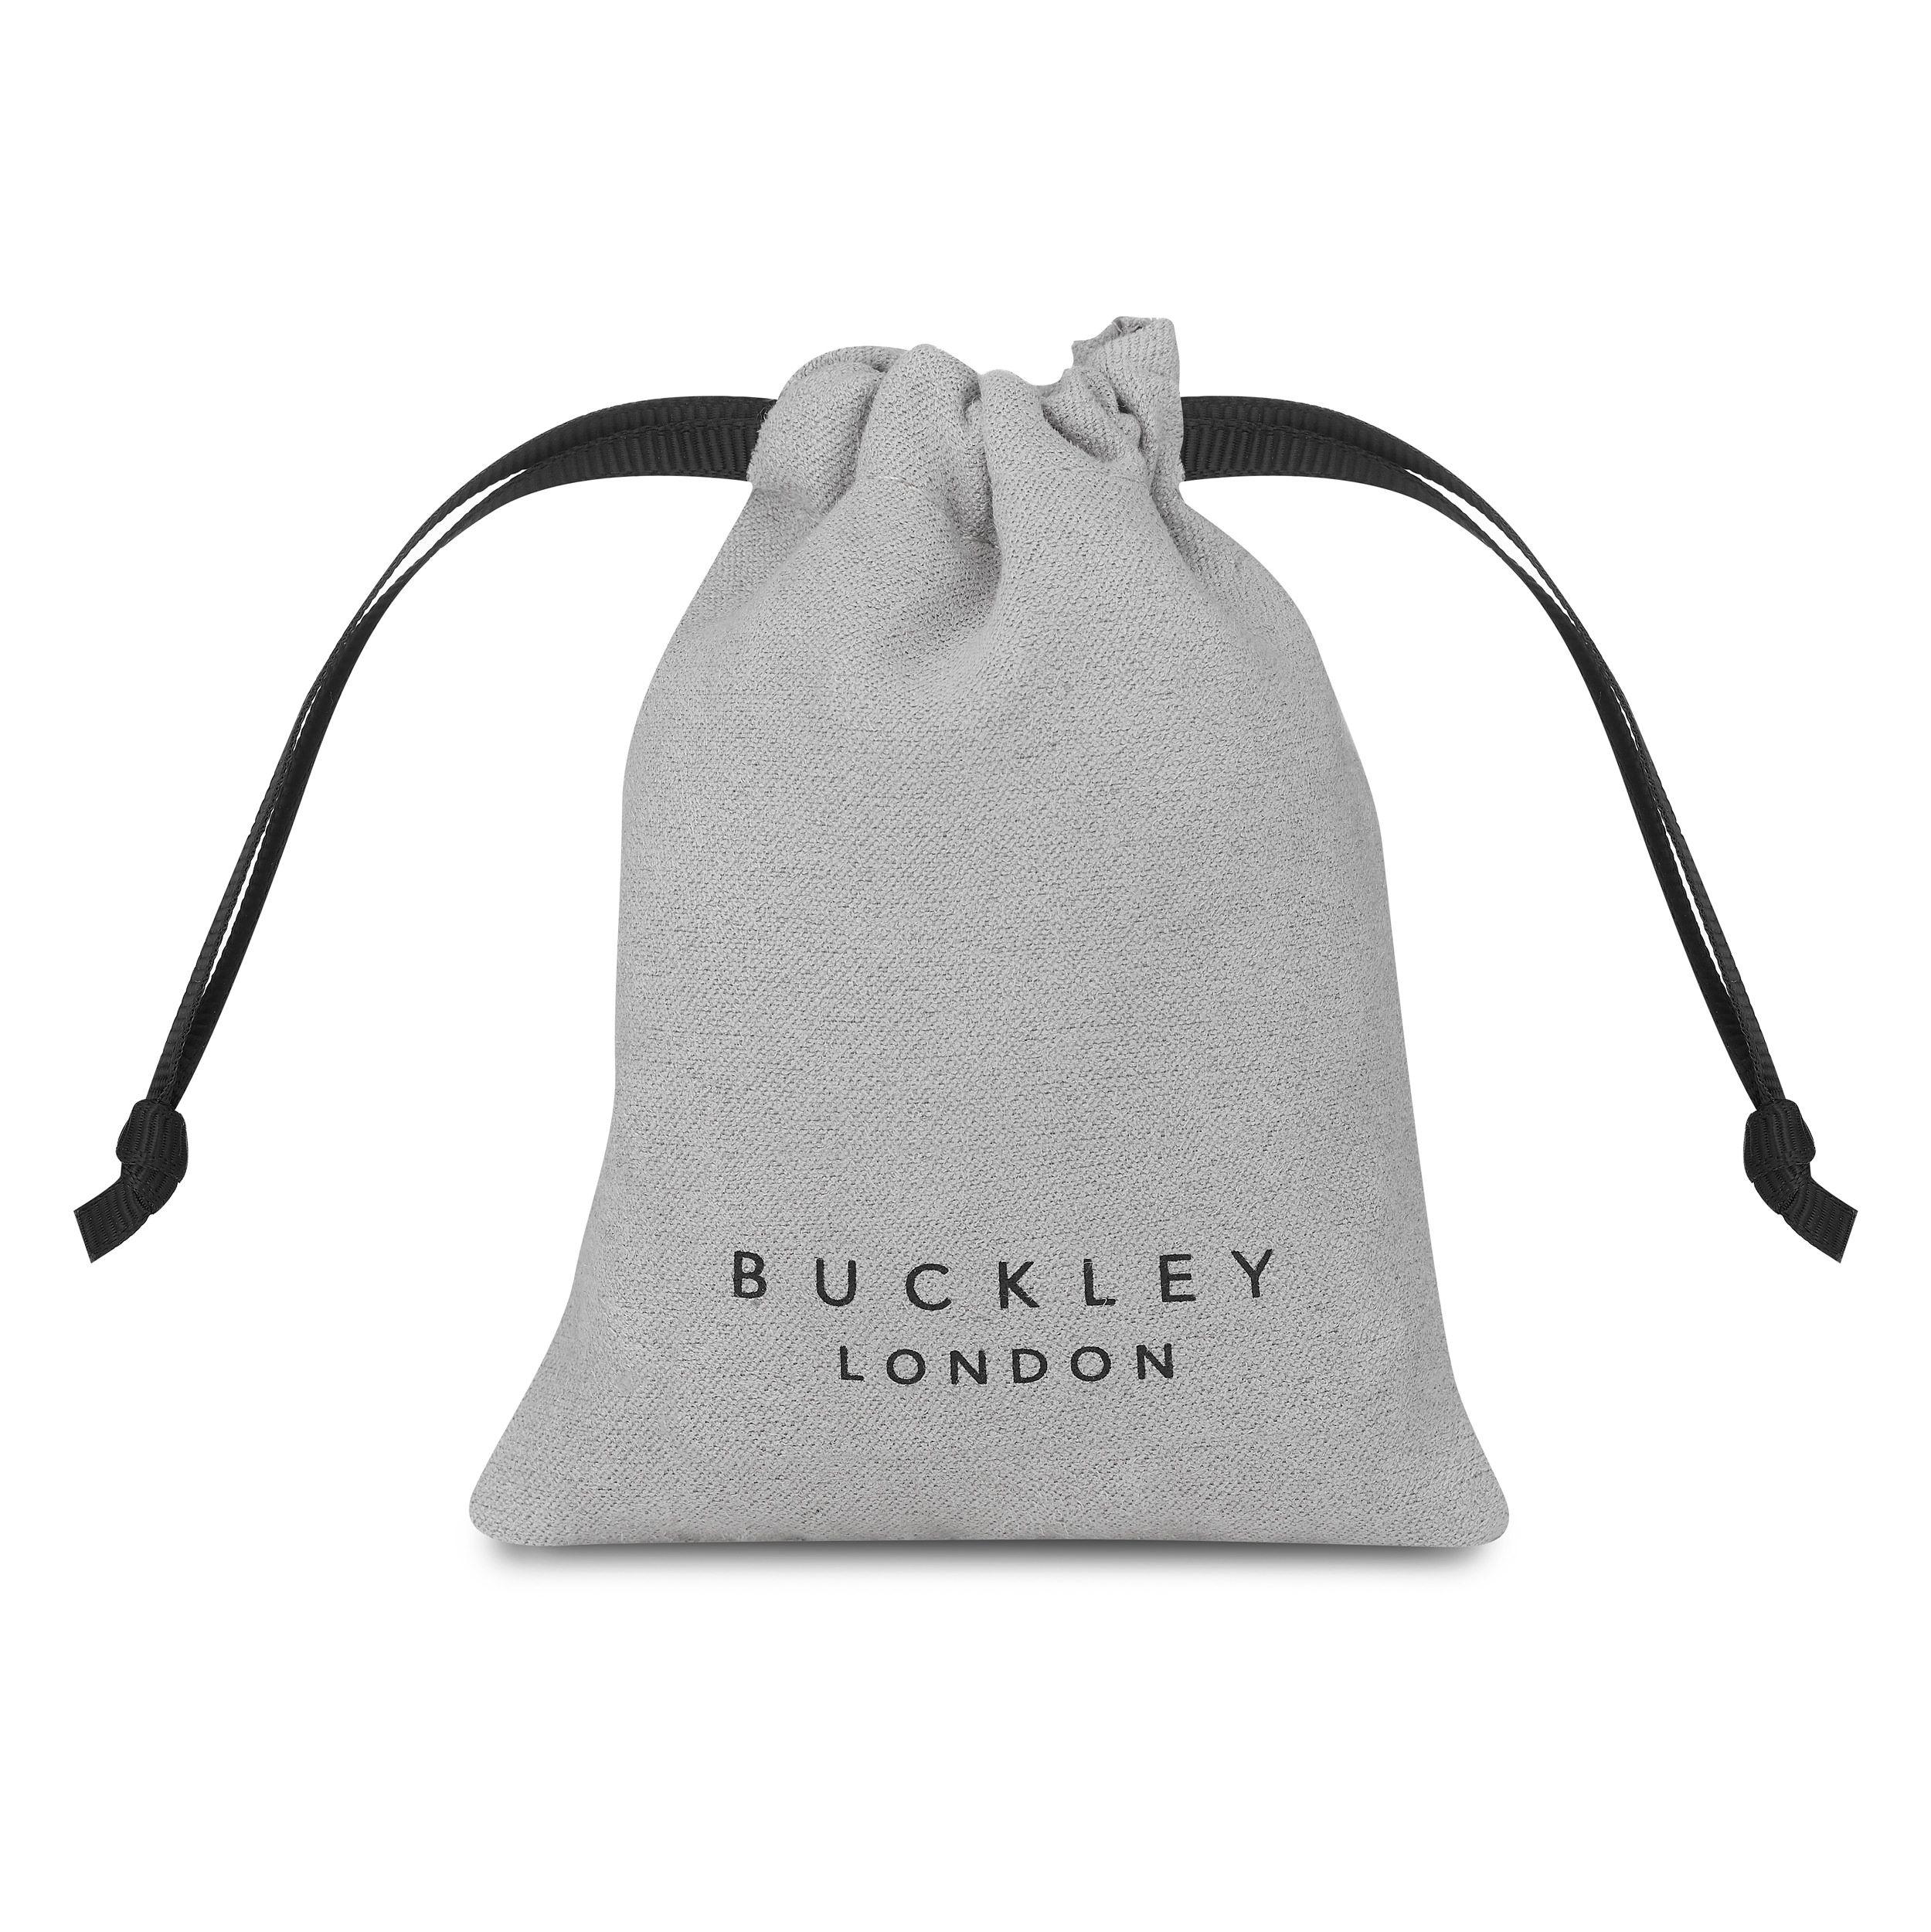 Buckley London Hugs & Kisses '♥' Bracelet - Rose Gold Bag